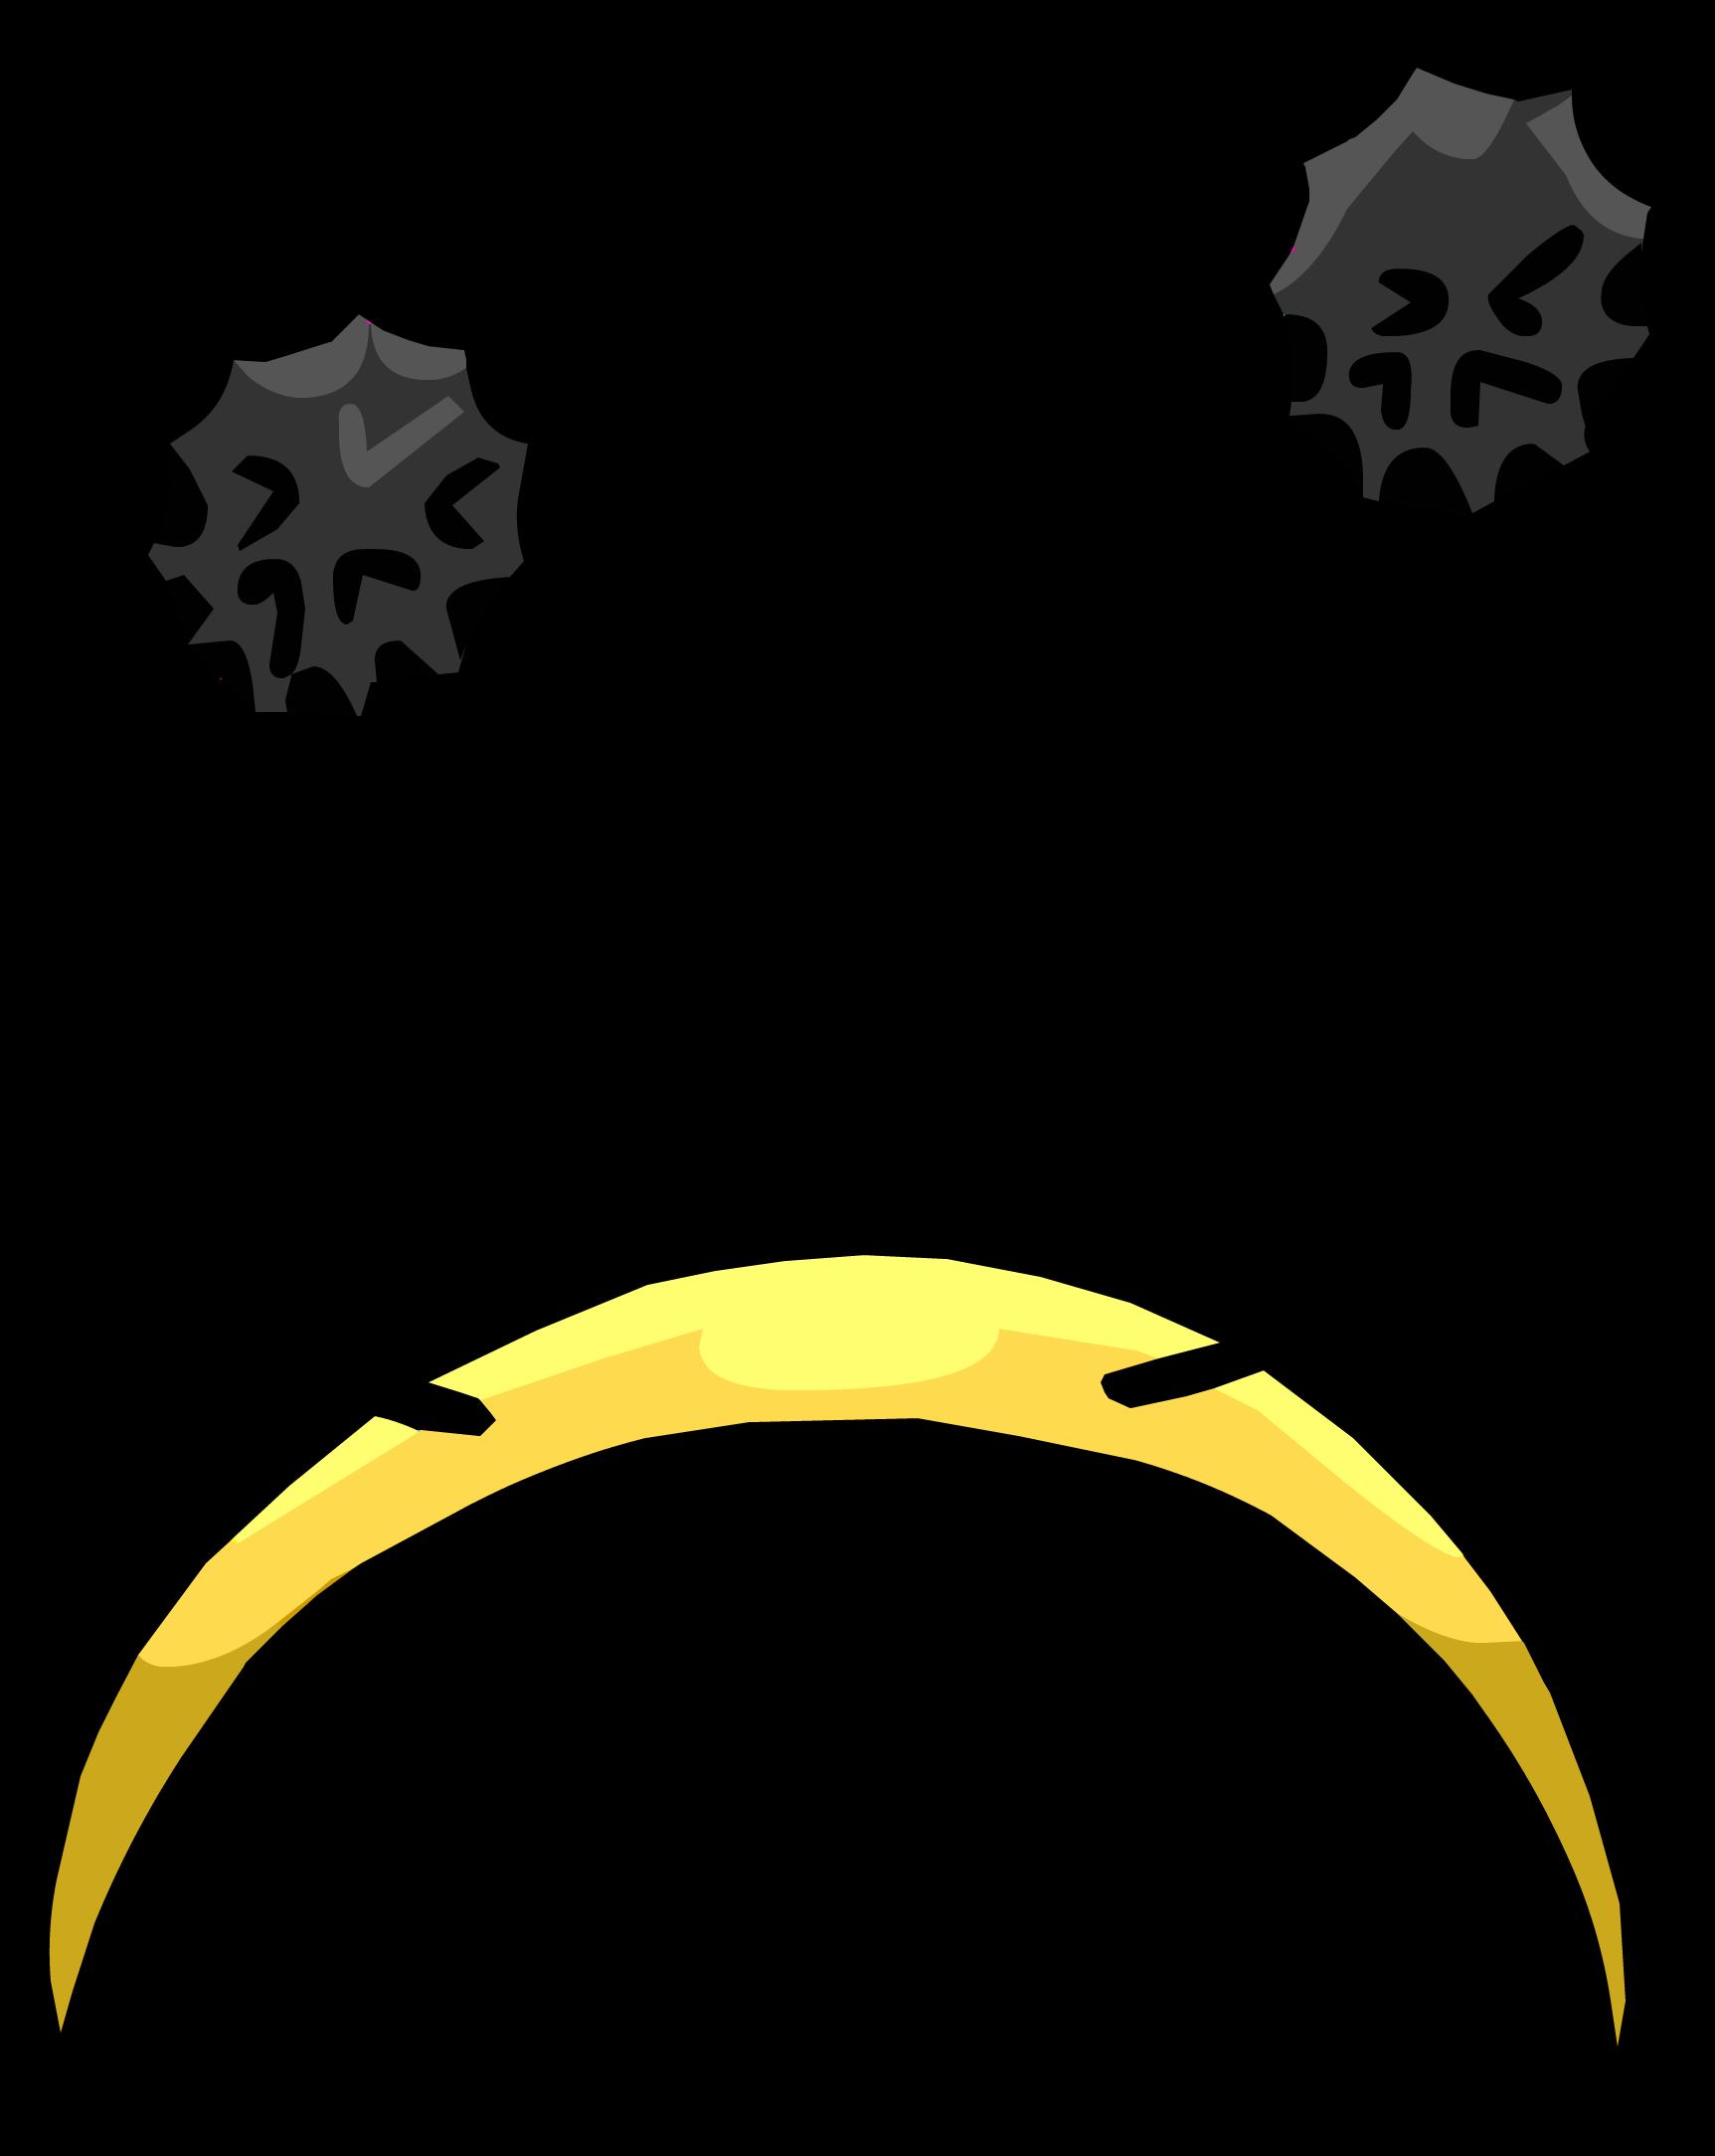 Clipart doctor headband. Bee antennae club penguin